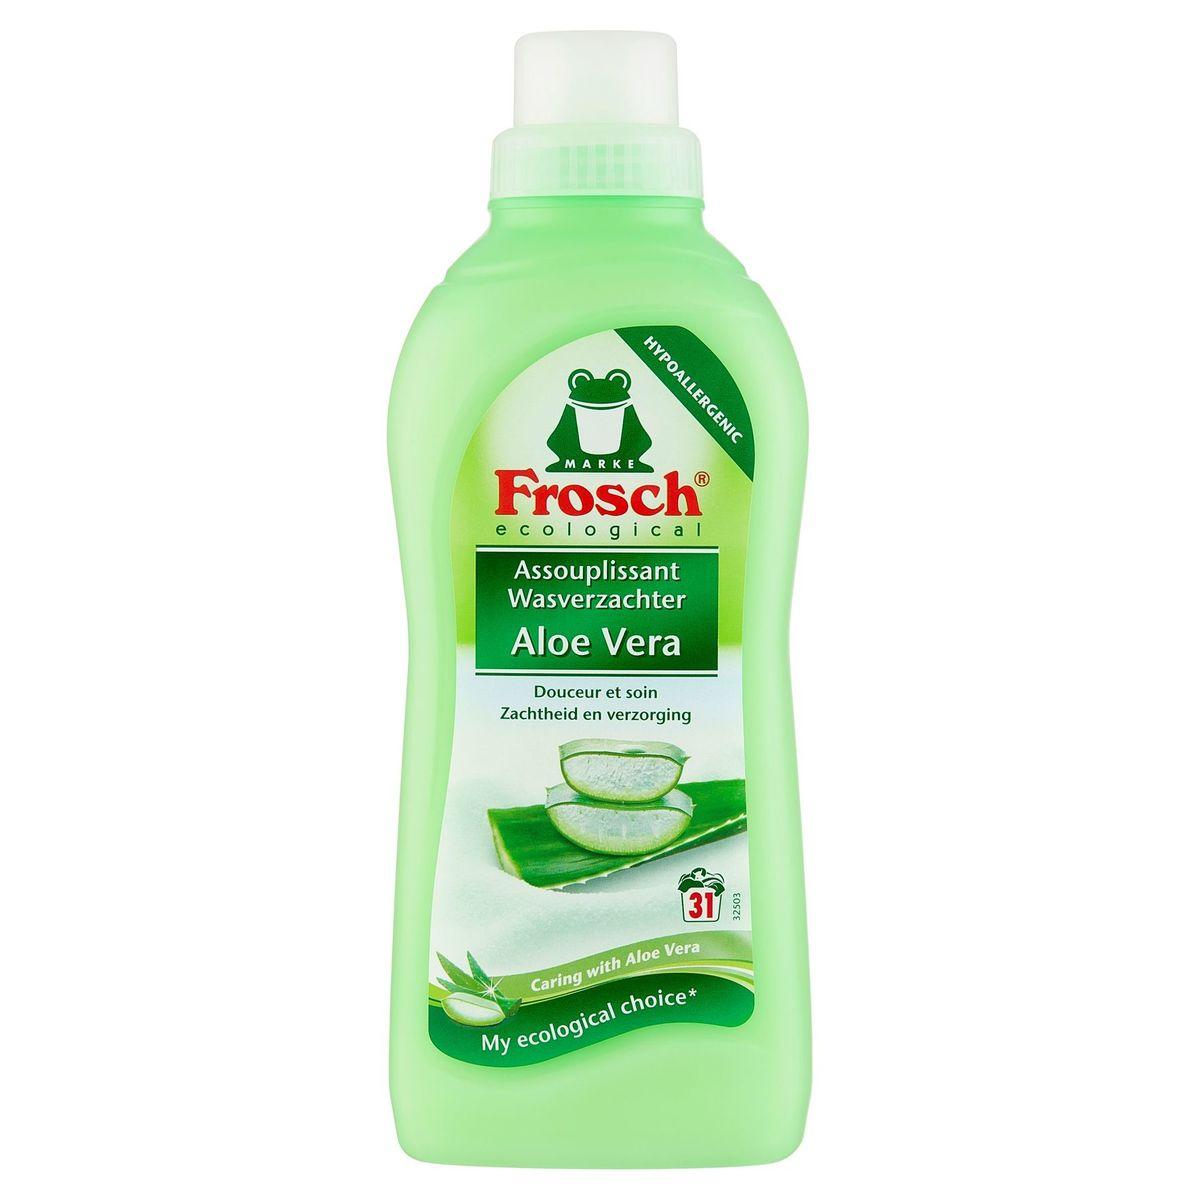 Frosch Ecological Wasverzachter Aloe Vera 31 Wasbeurten 750 ml